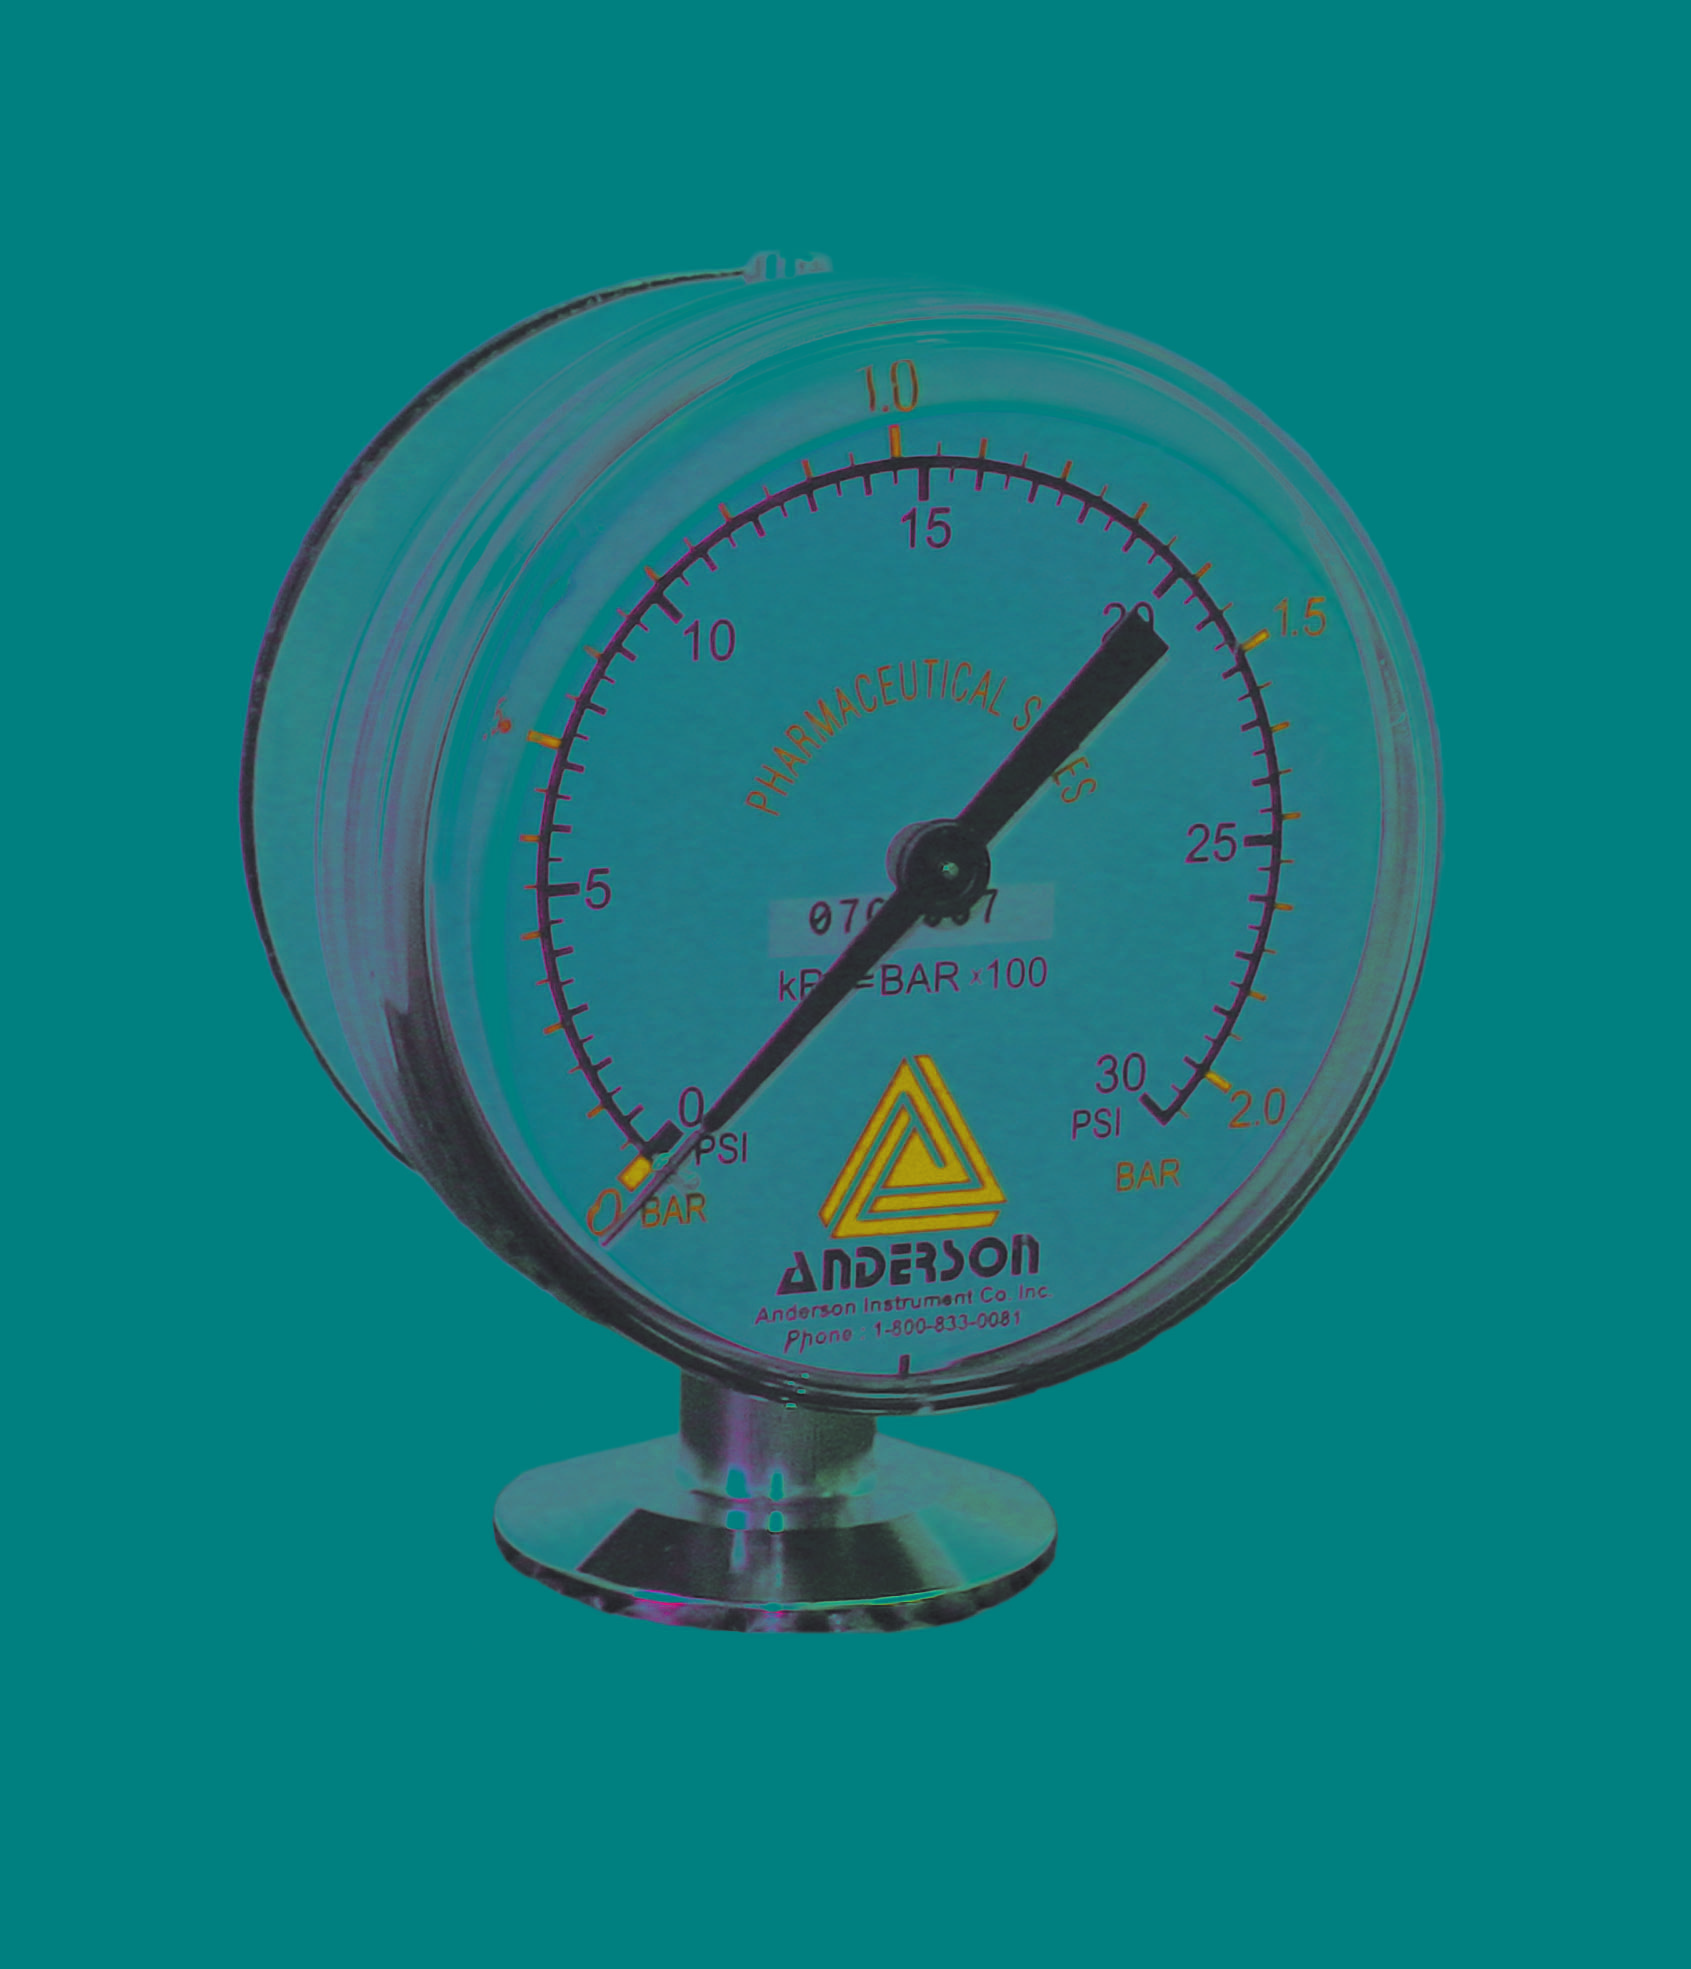 EB Pressure Gauge - Array - Img 1 - Anderson-Negele